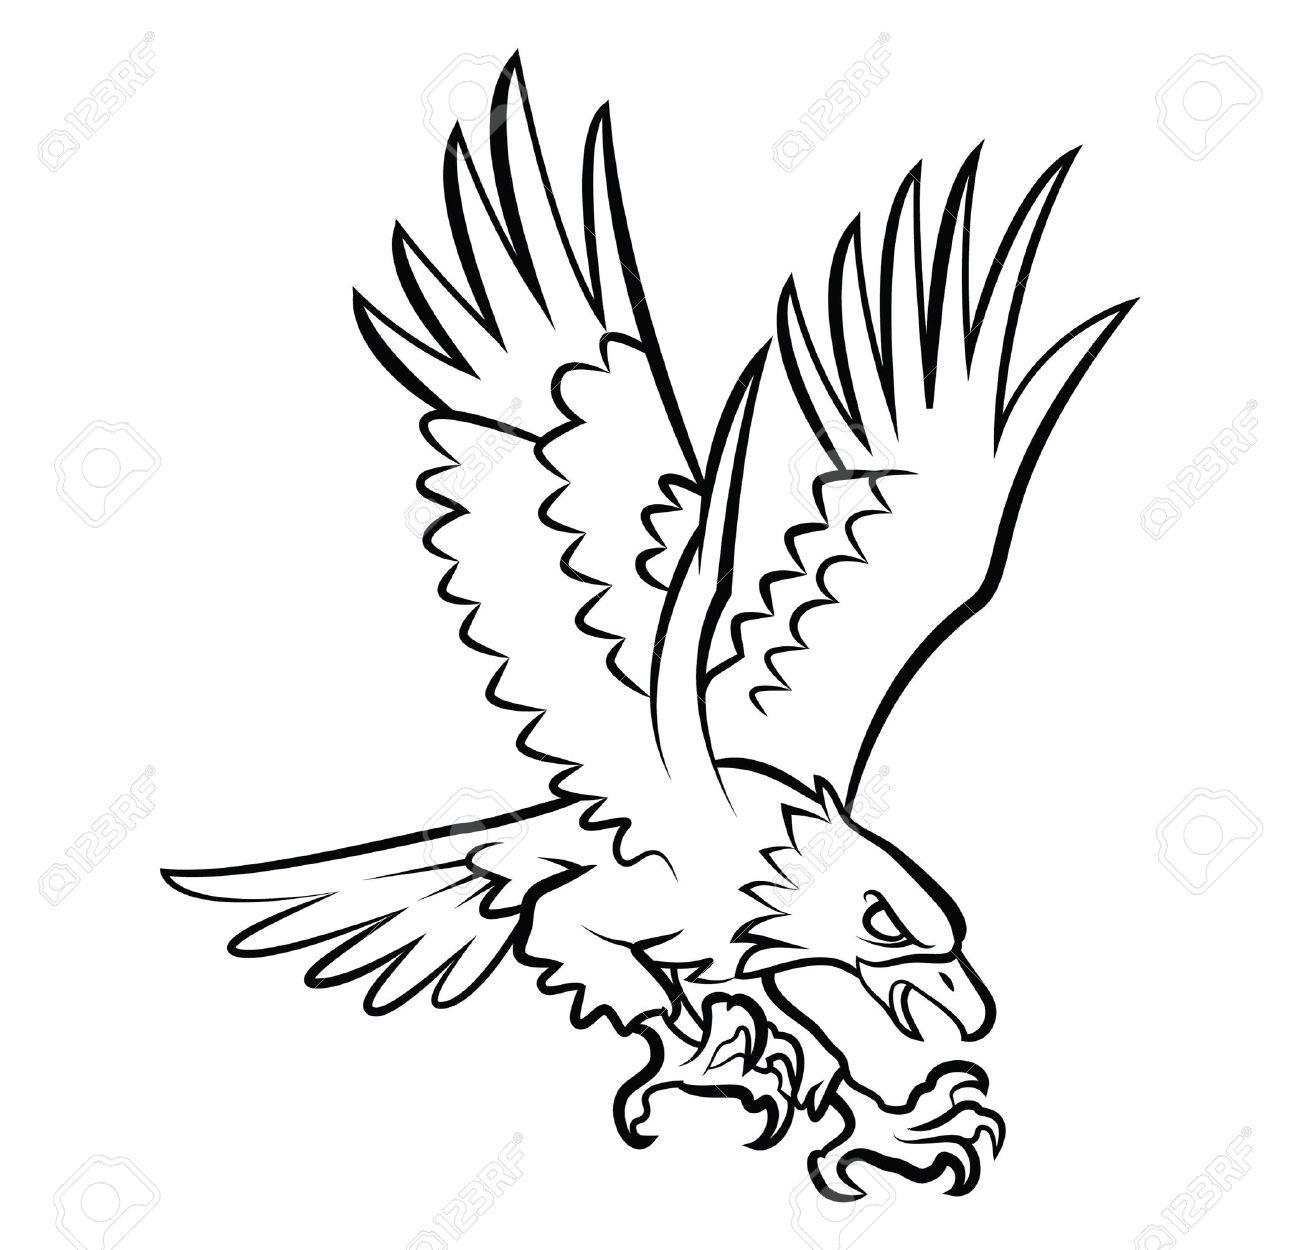 1300x1250 34,554 Hawk Stock Vector Illustration And Royalty Free Hawk Clipart